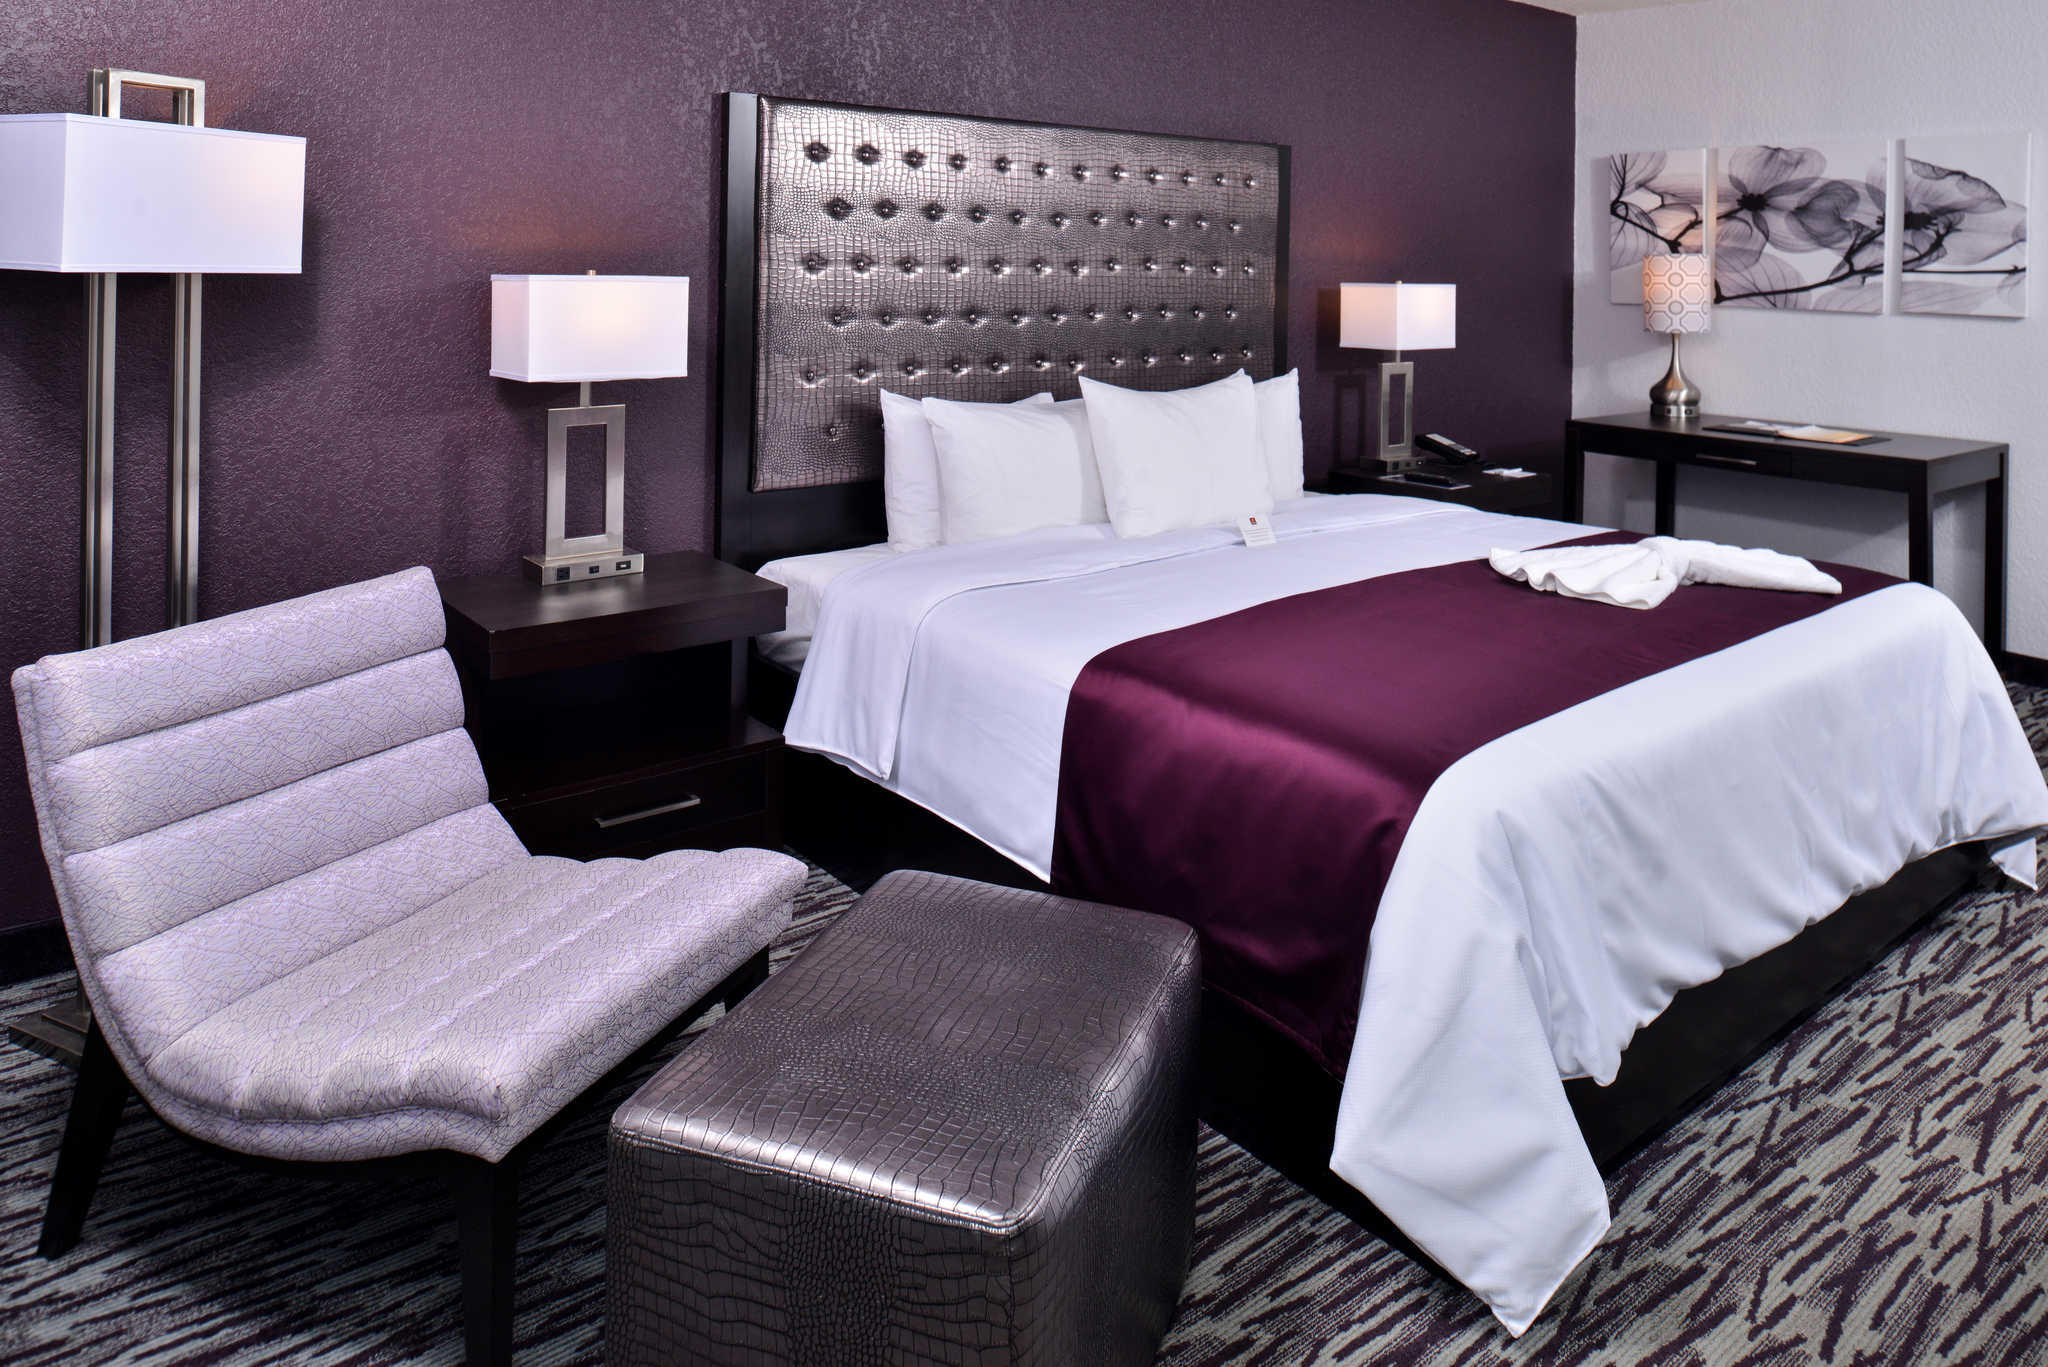 Clarion Inn & Suites Orlando near Theme Parks image 10